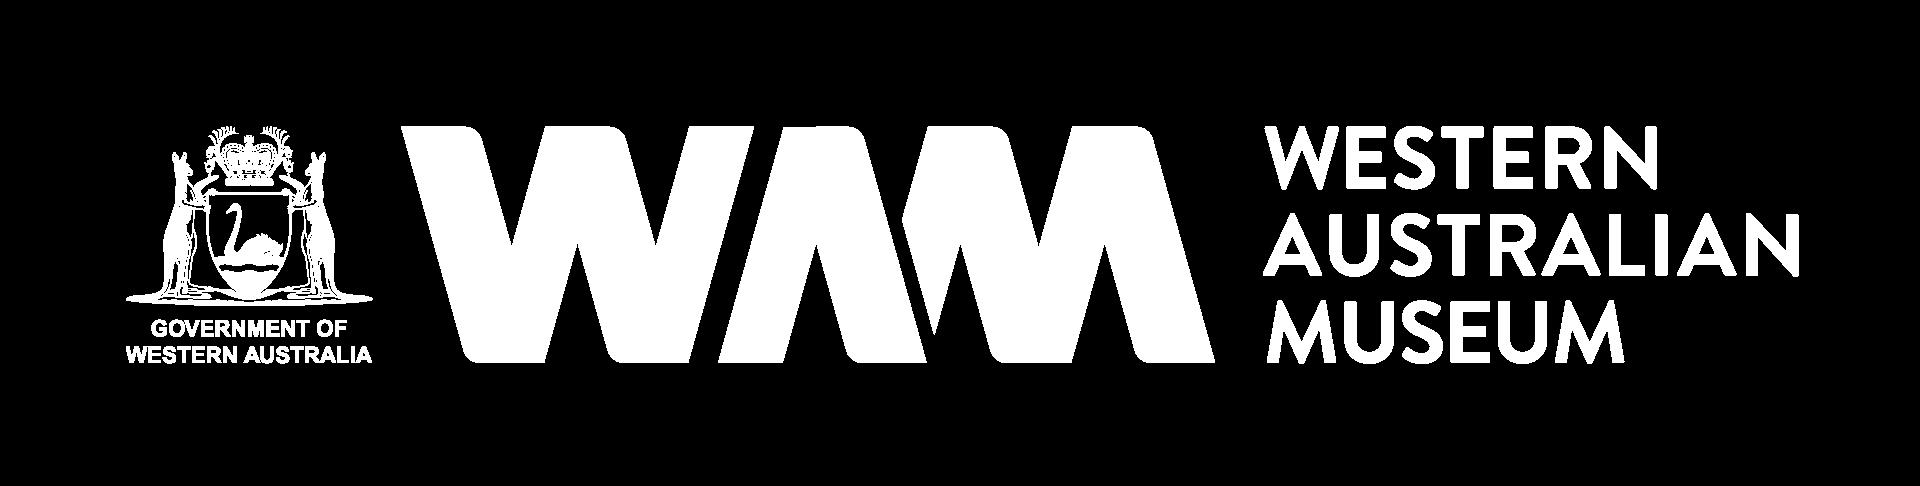 WA_Museum_MASTER_MONO_WHITE